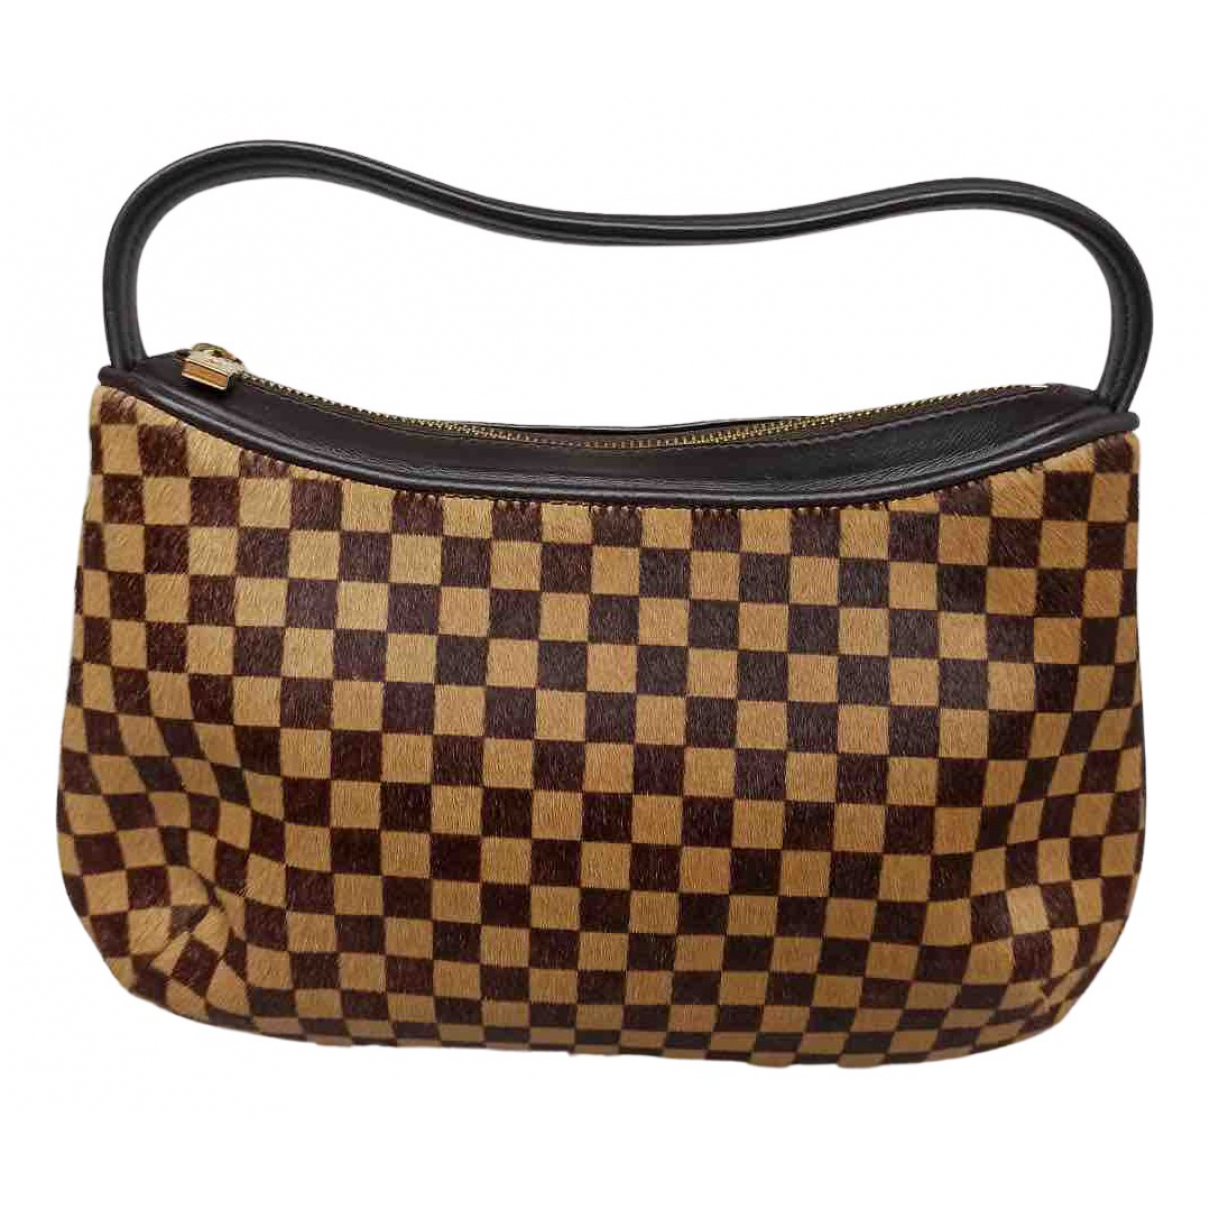 Louis Vuitton N Brown Pony-style calfskin handbag for Women N